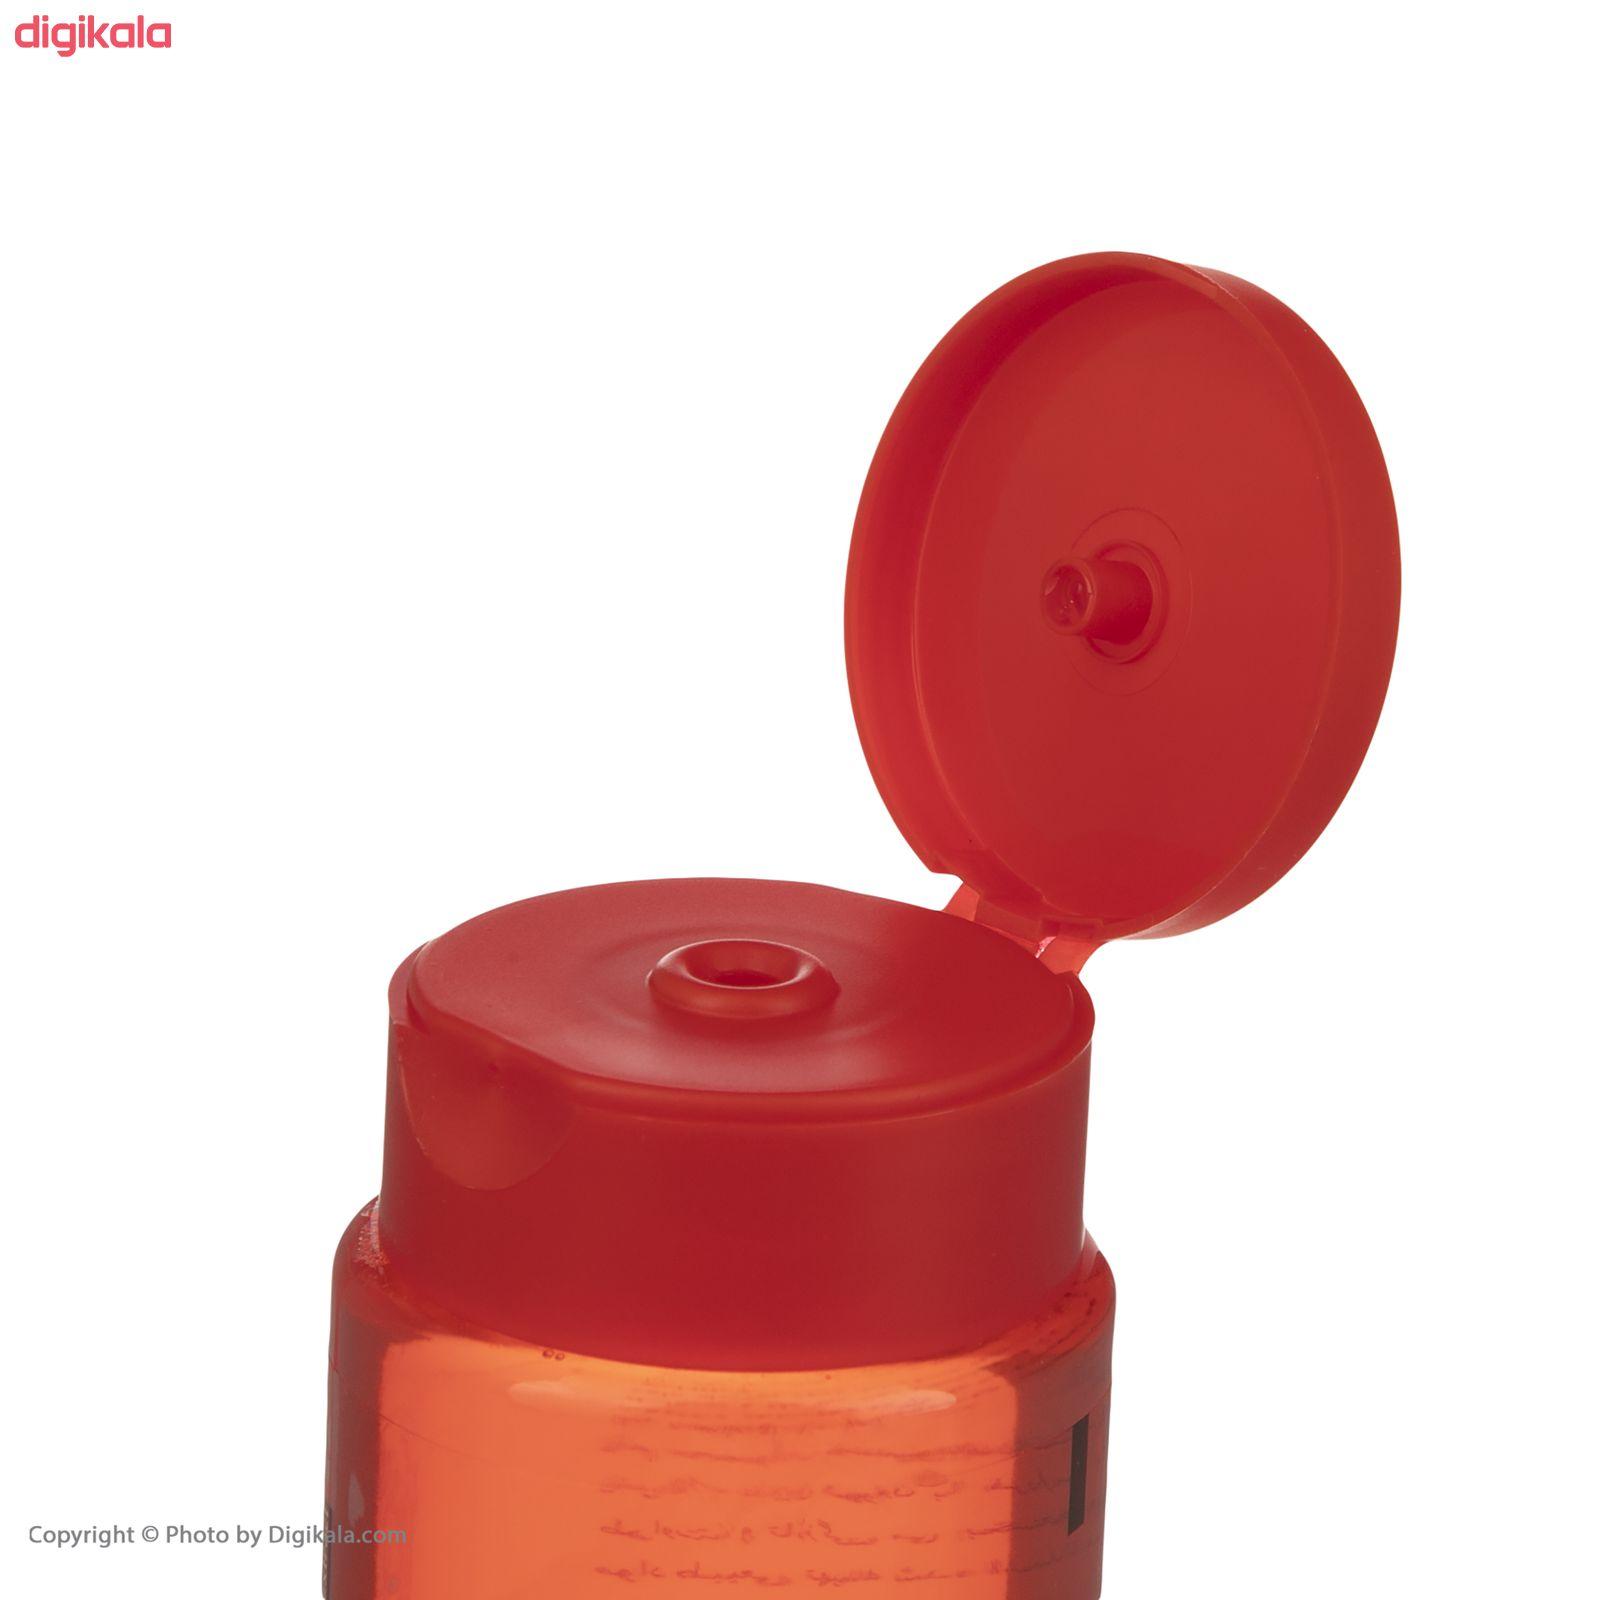 شامپو بدن شون مدل Pomegranate حجم 420 میلی لیتر main 1 4